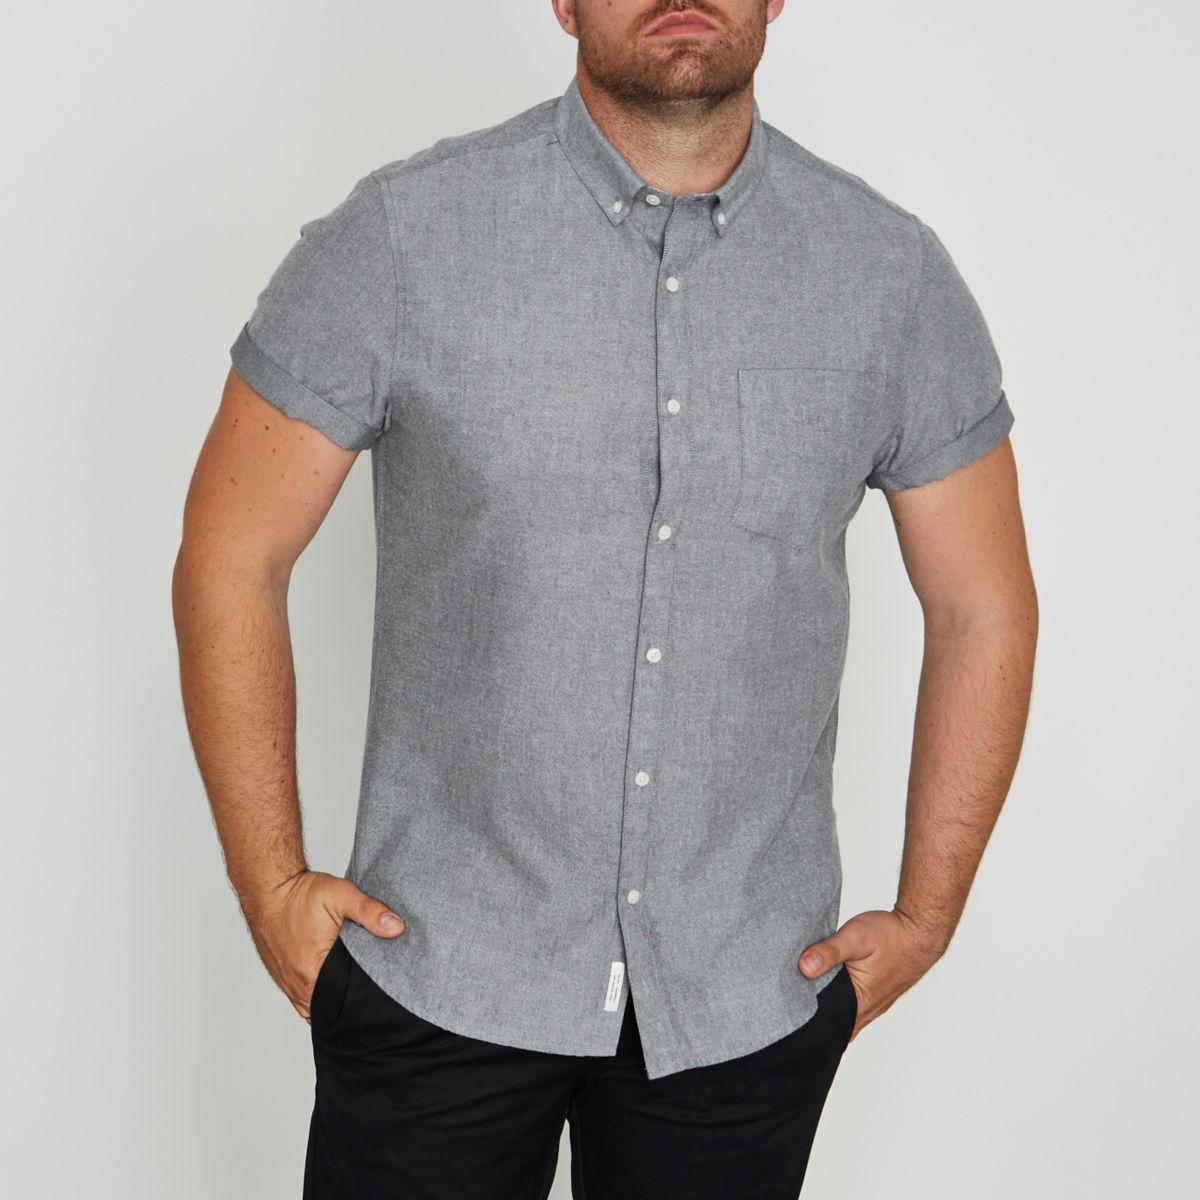 Big and Tall – Chemise grise brossée à manches courtes